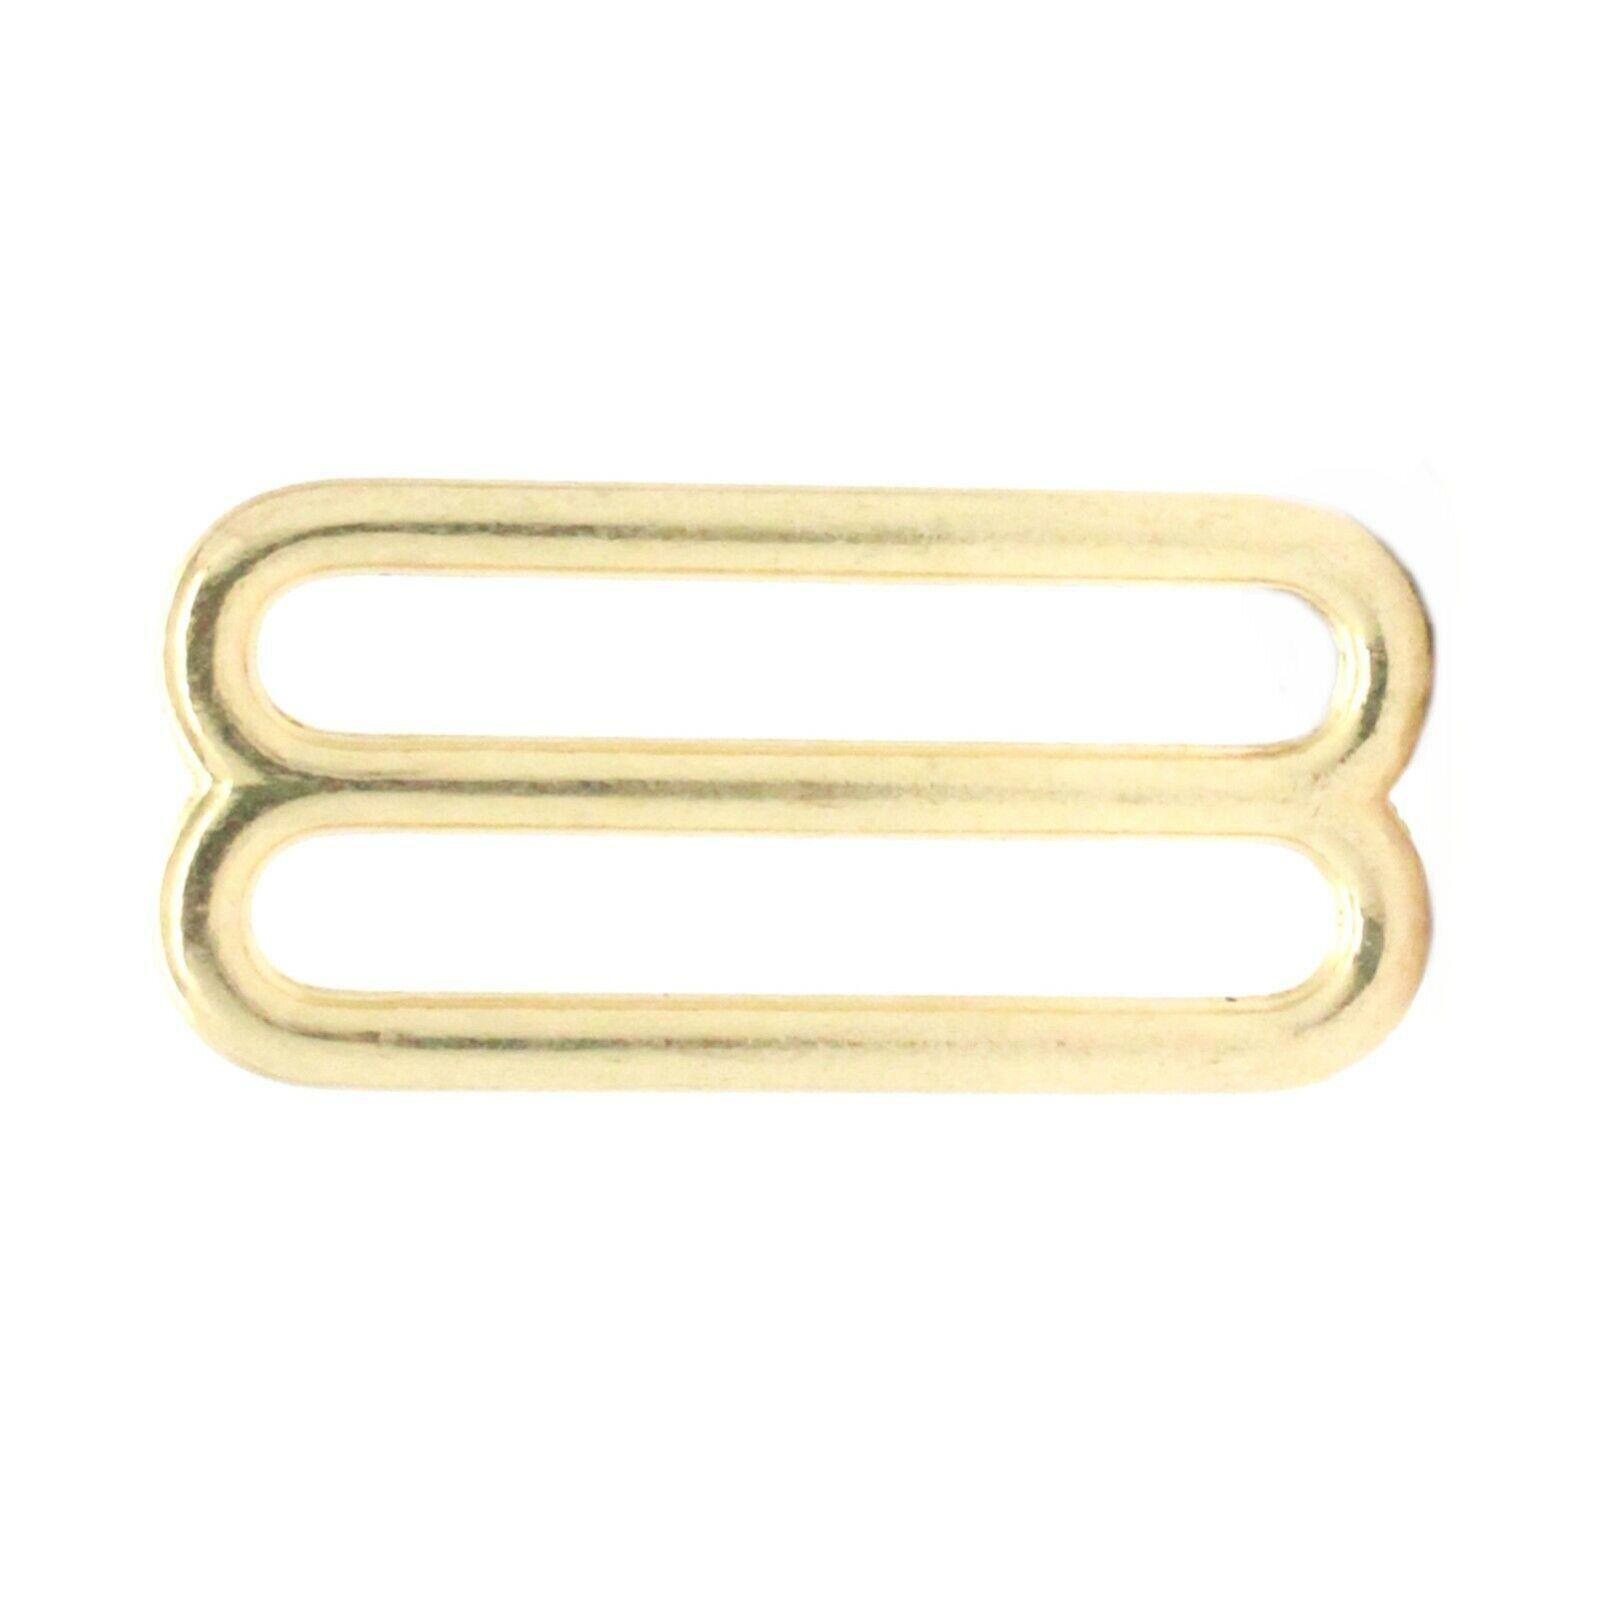 double loop strap adjuster 1 5 inch